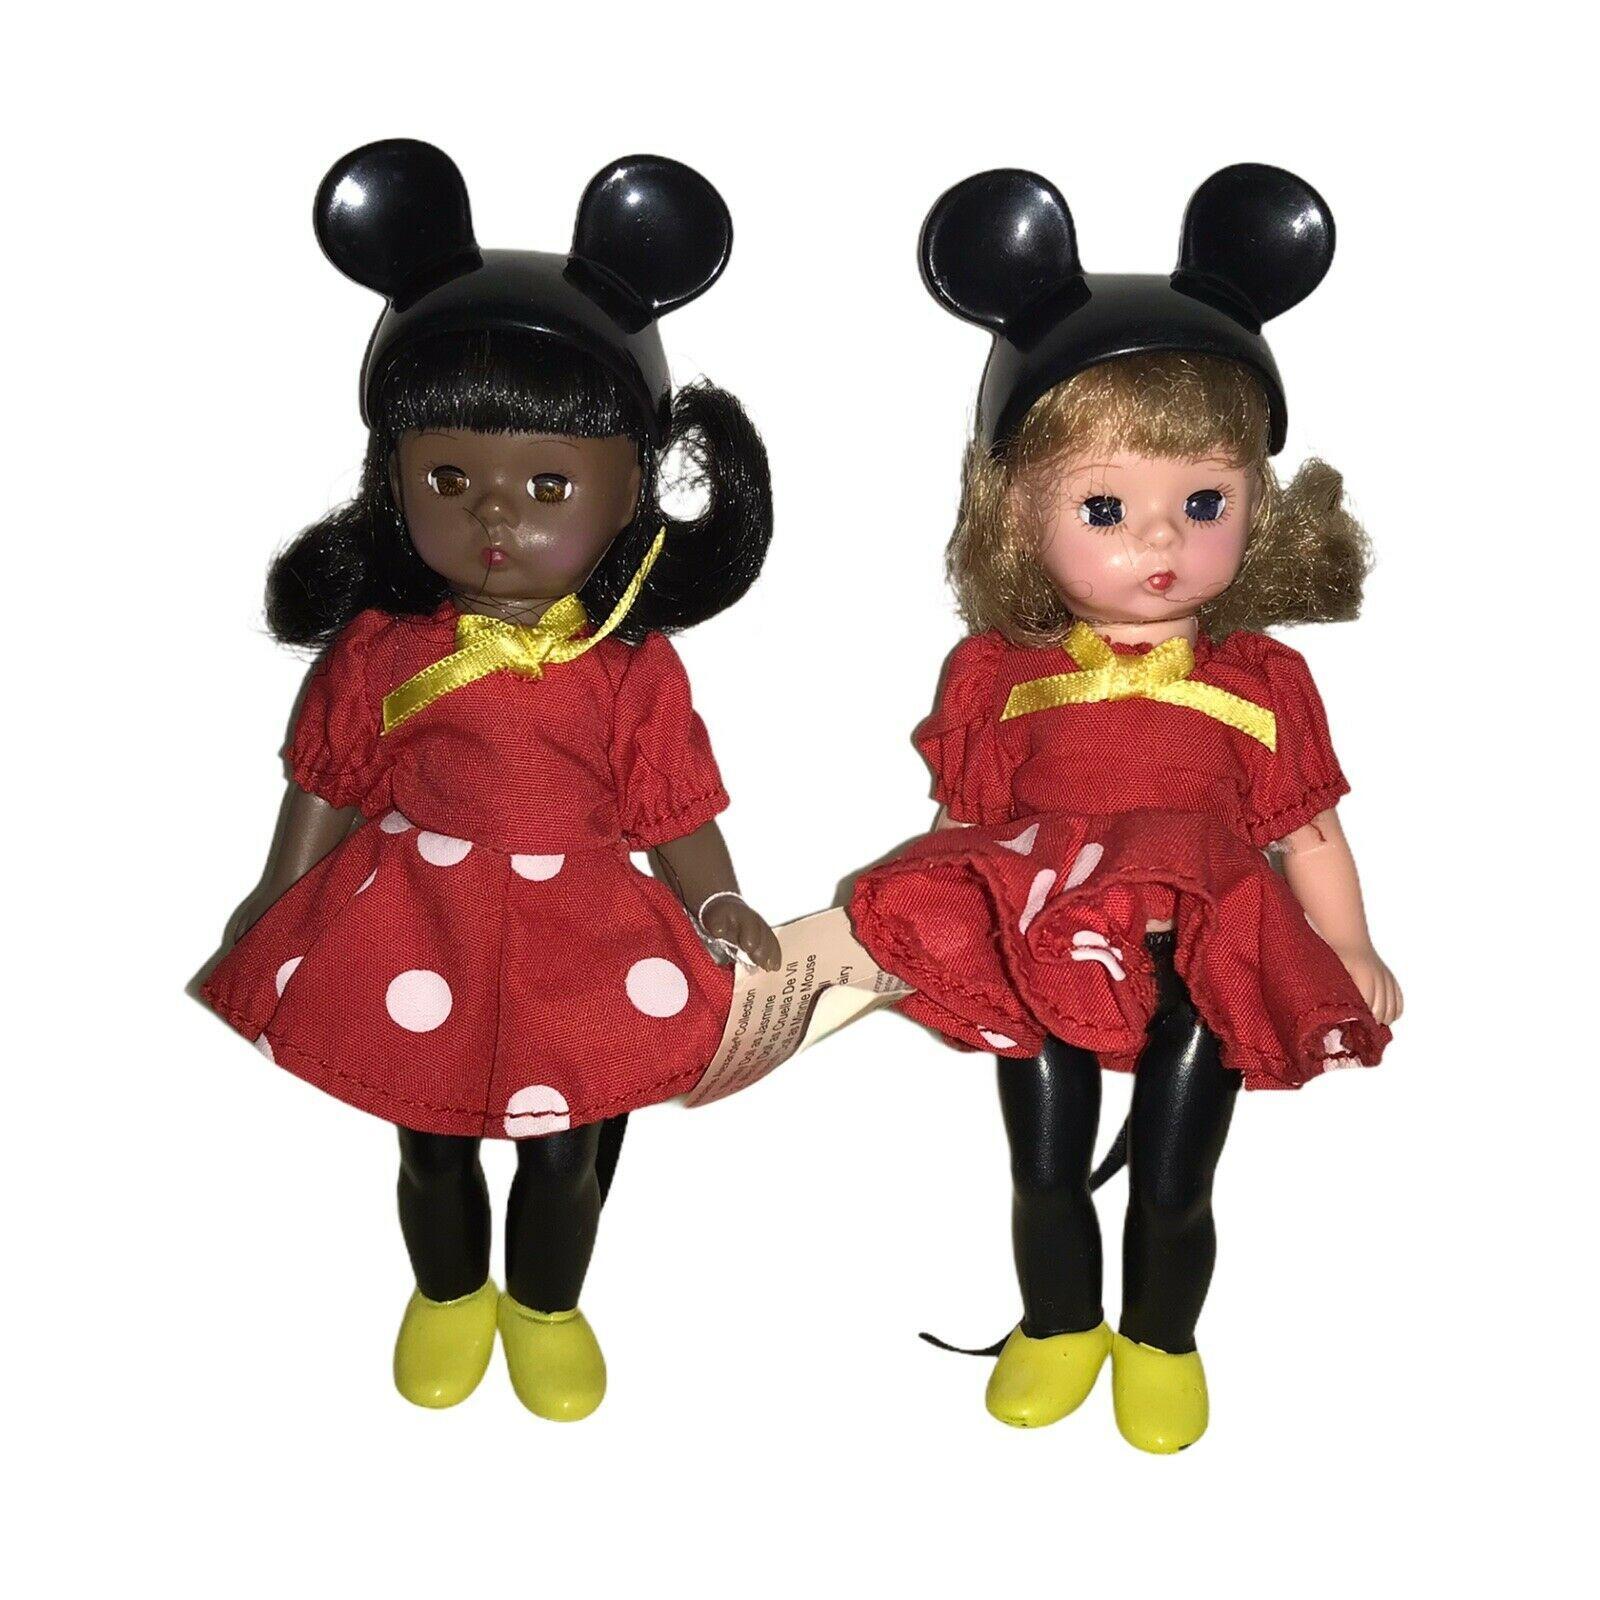 2 Madame Alexander as Minnie Mouse - $17.82